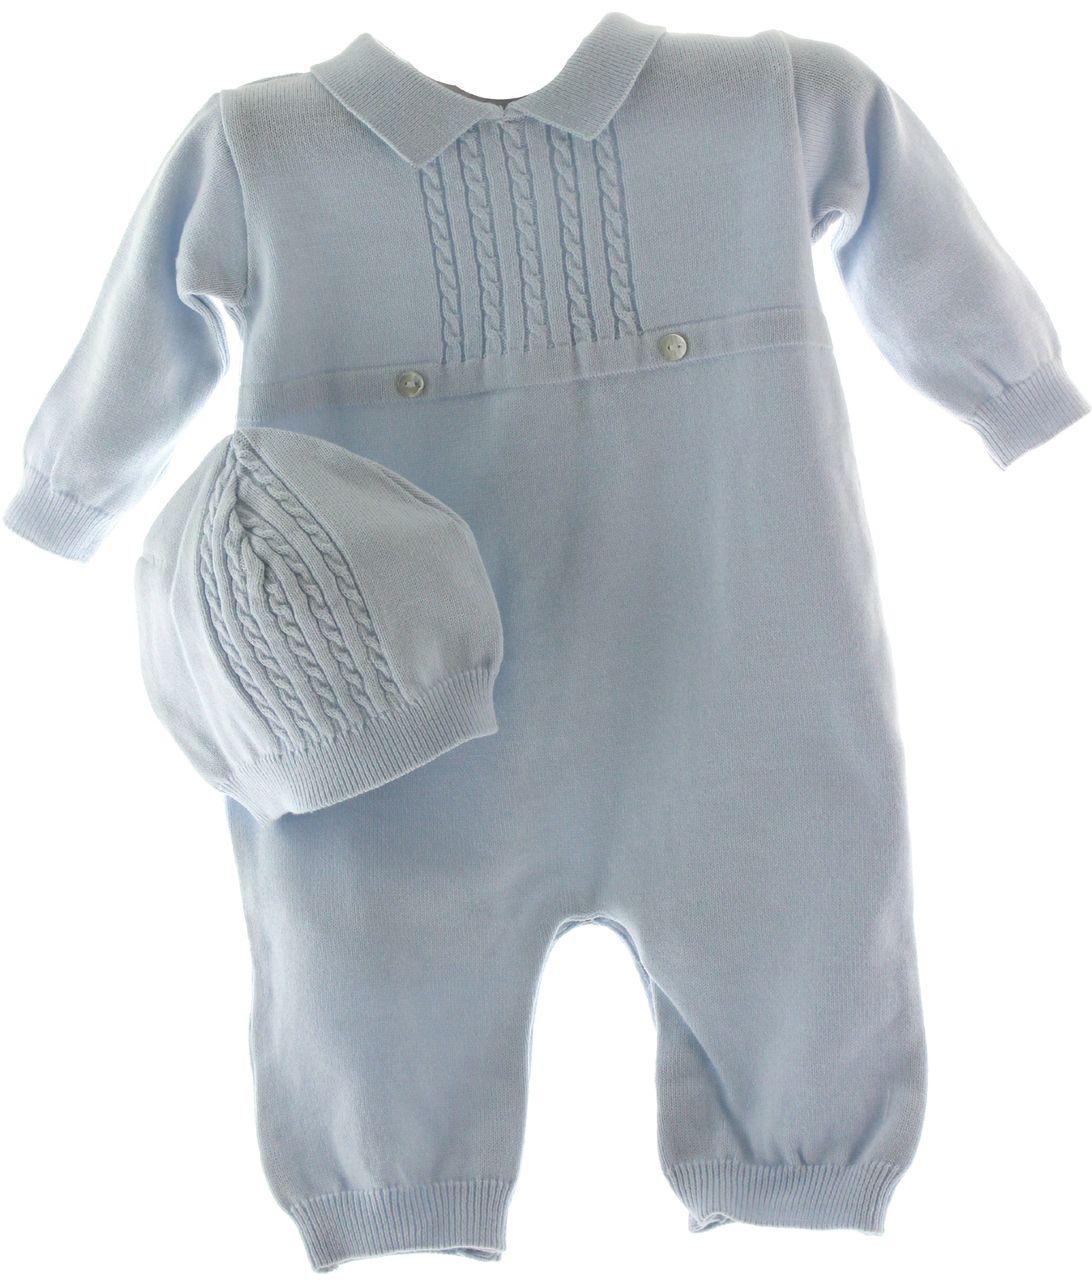 6c10a32b6 Baby Boys Blue Knit Long Sleeve Romper & Hat Set   Knit Layette Sets ...